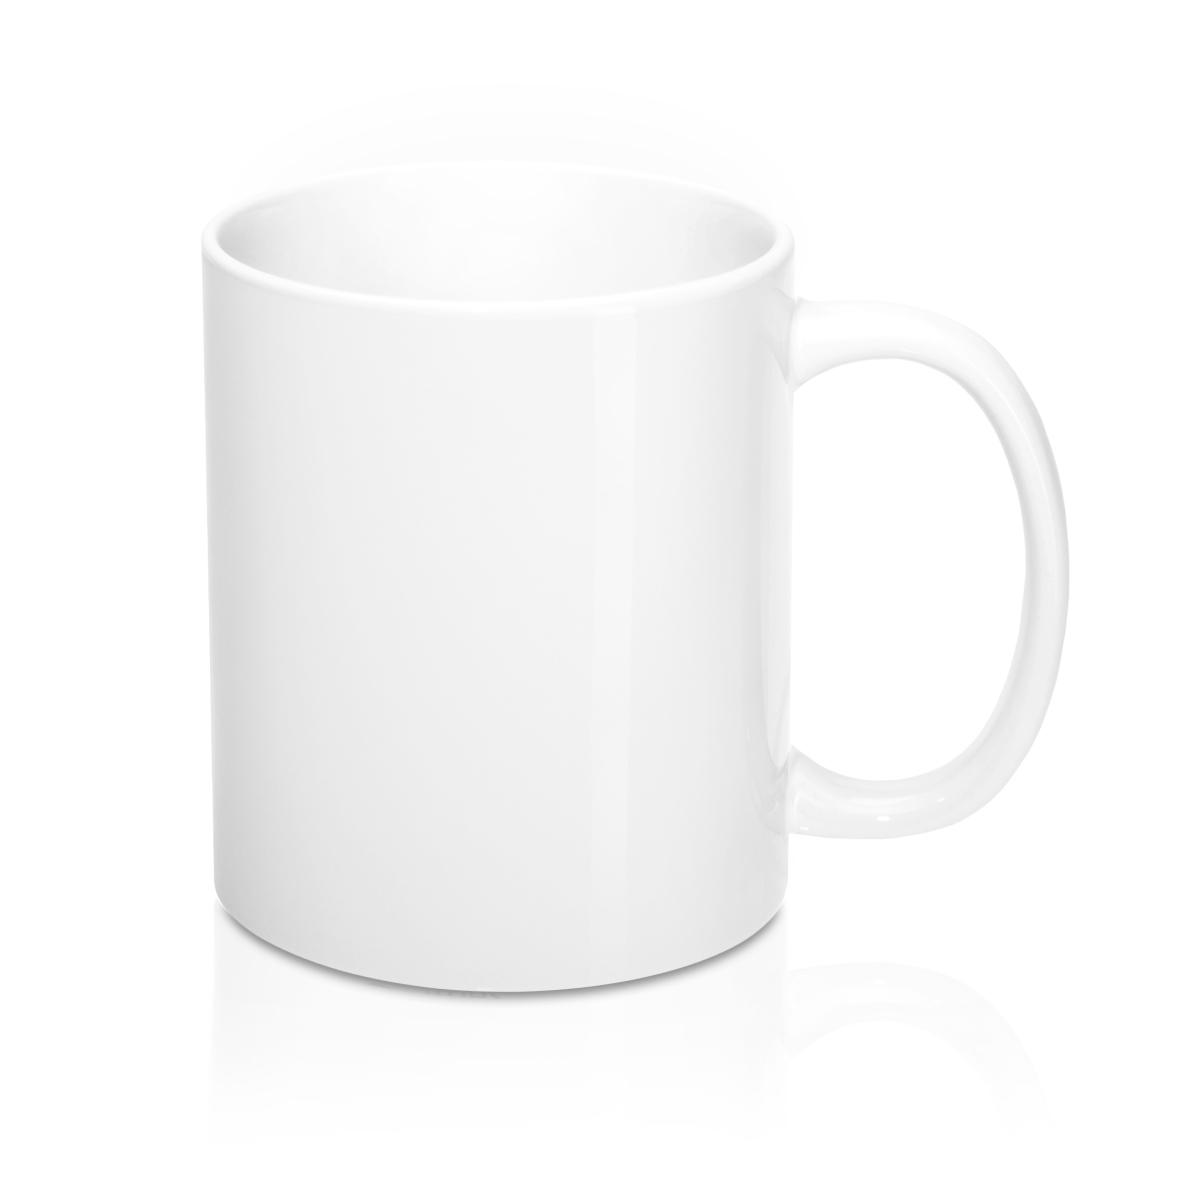 tdps coffee mug 11oz